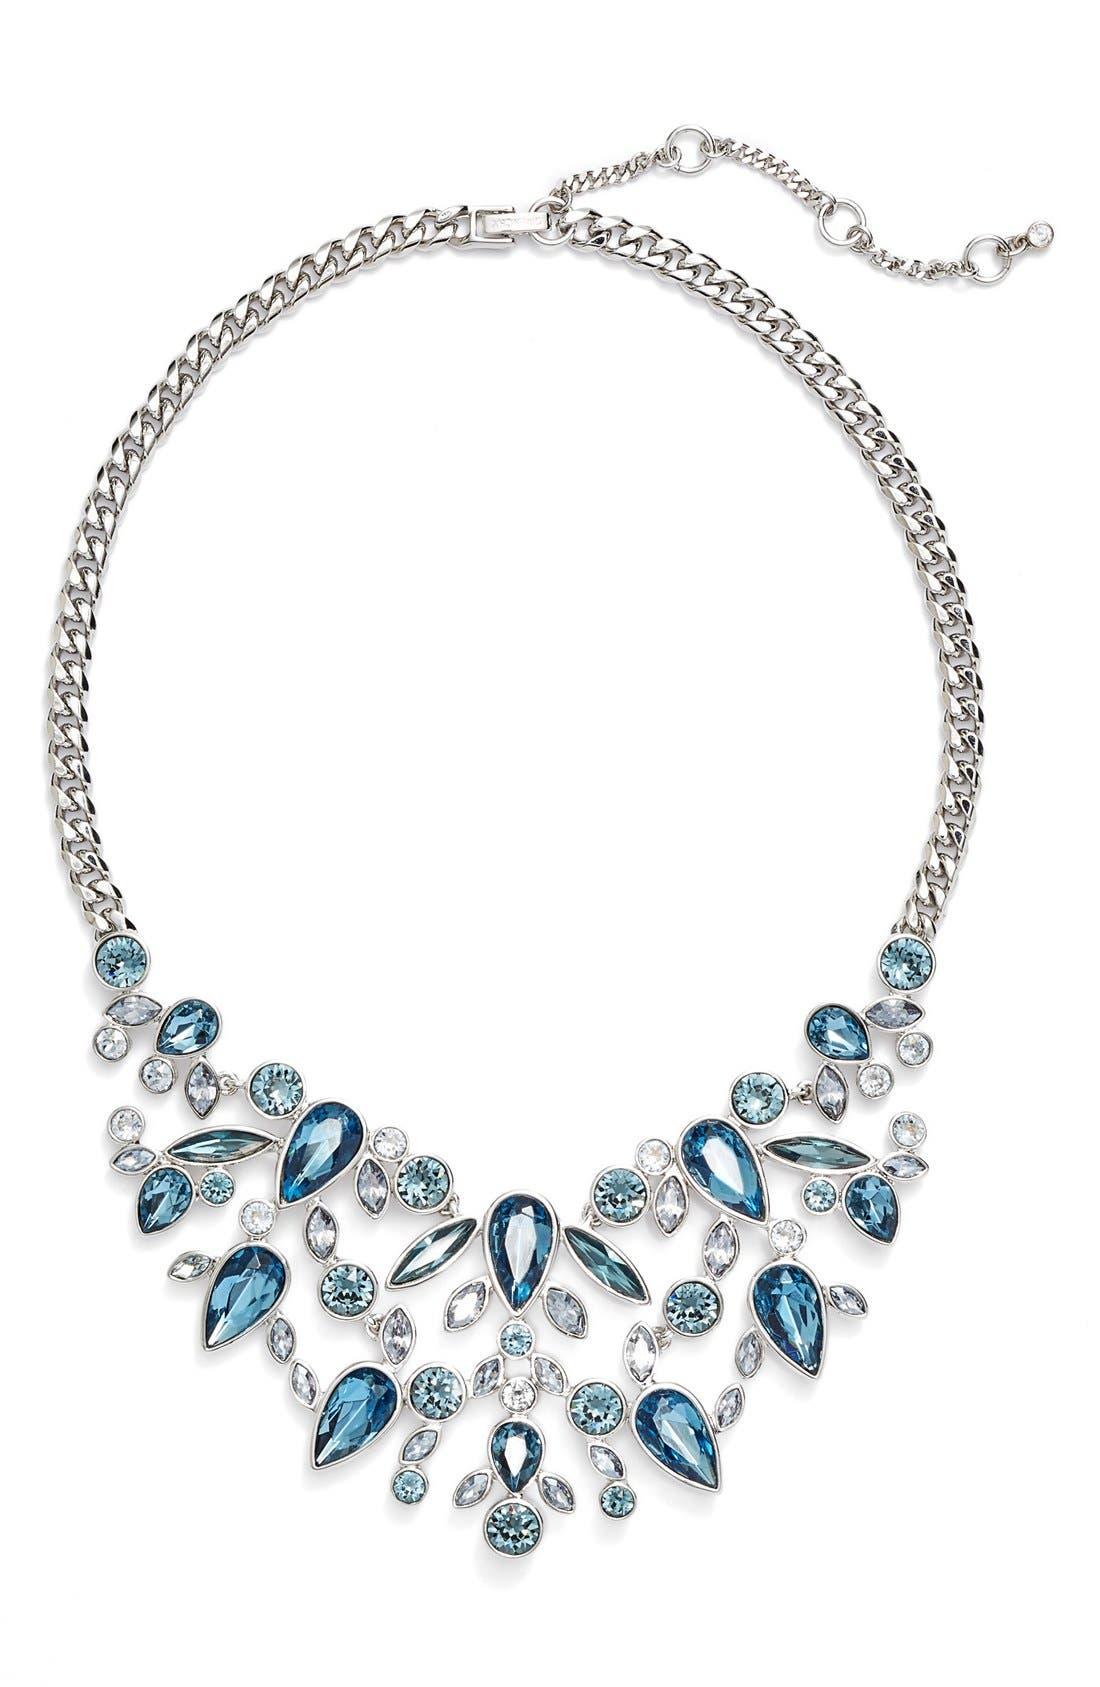 Main Image - Givenchy 'Drama' Bib Necklace